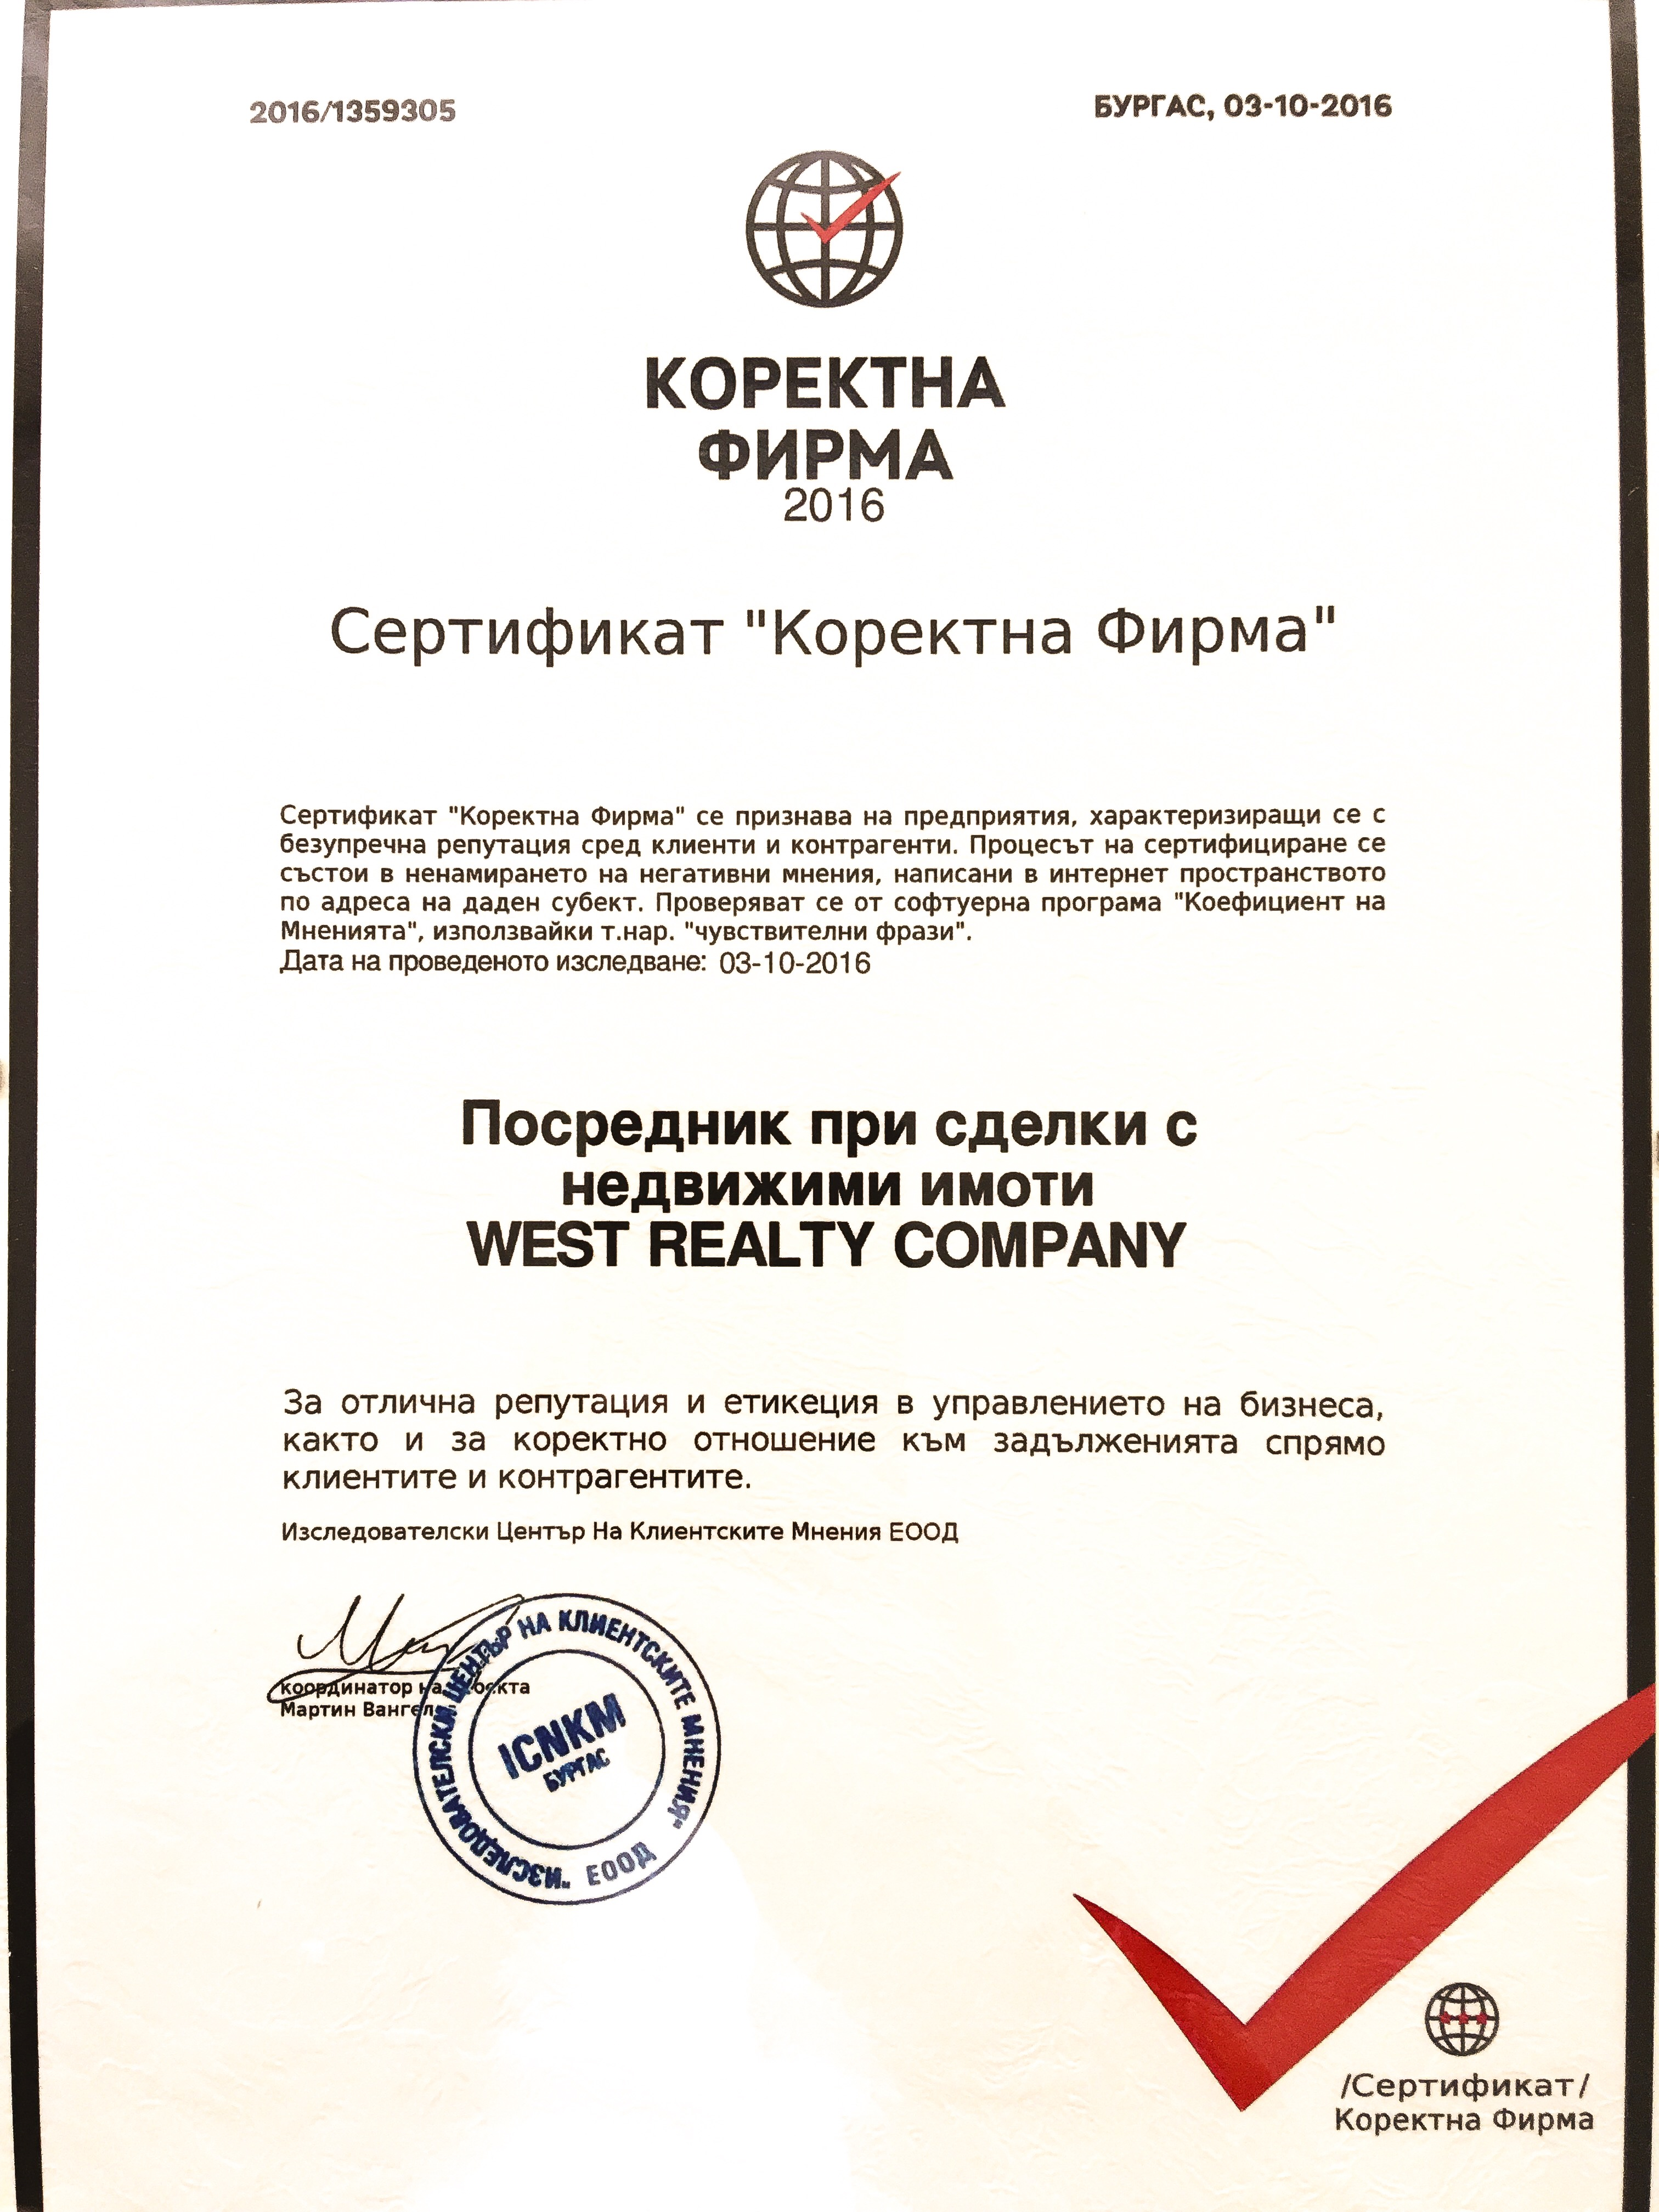 Сертификат за коректна фирма на West Realty Company